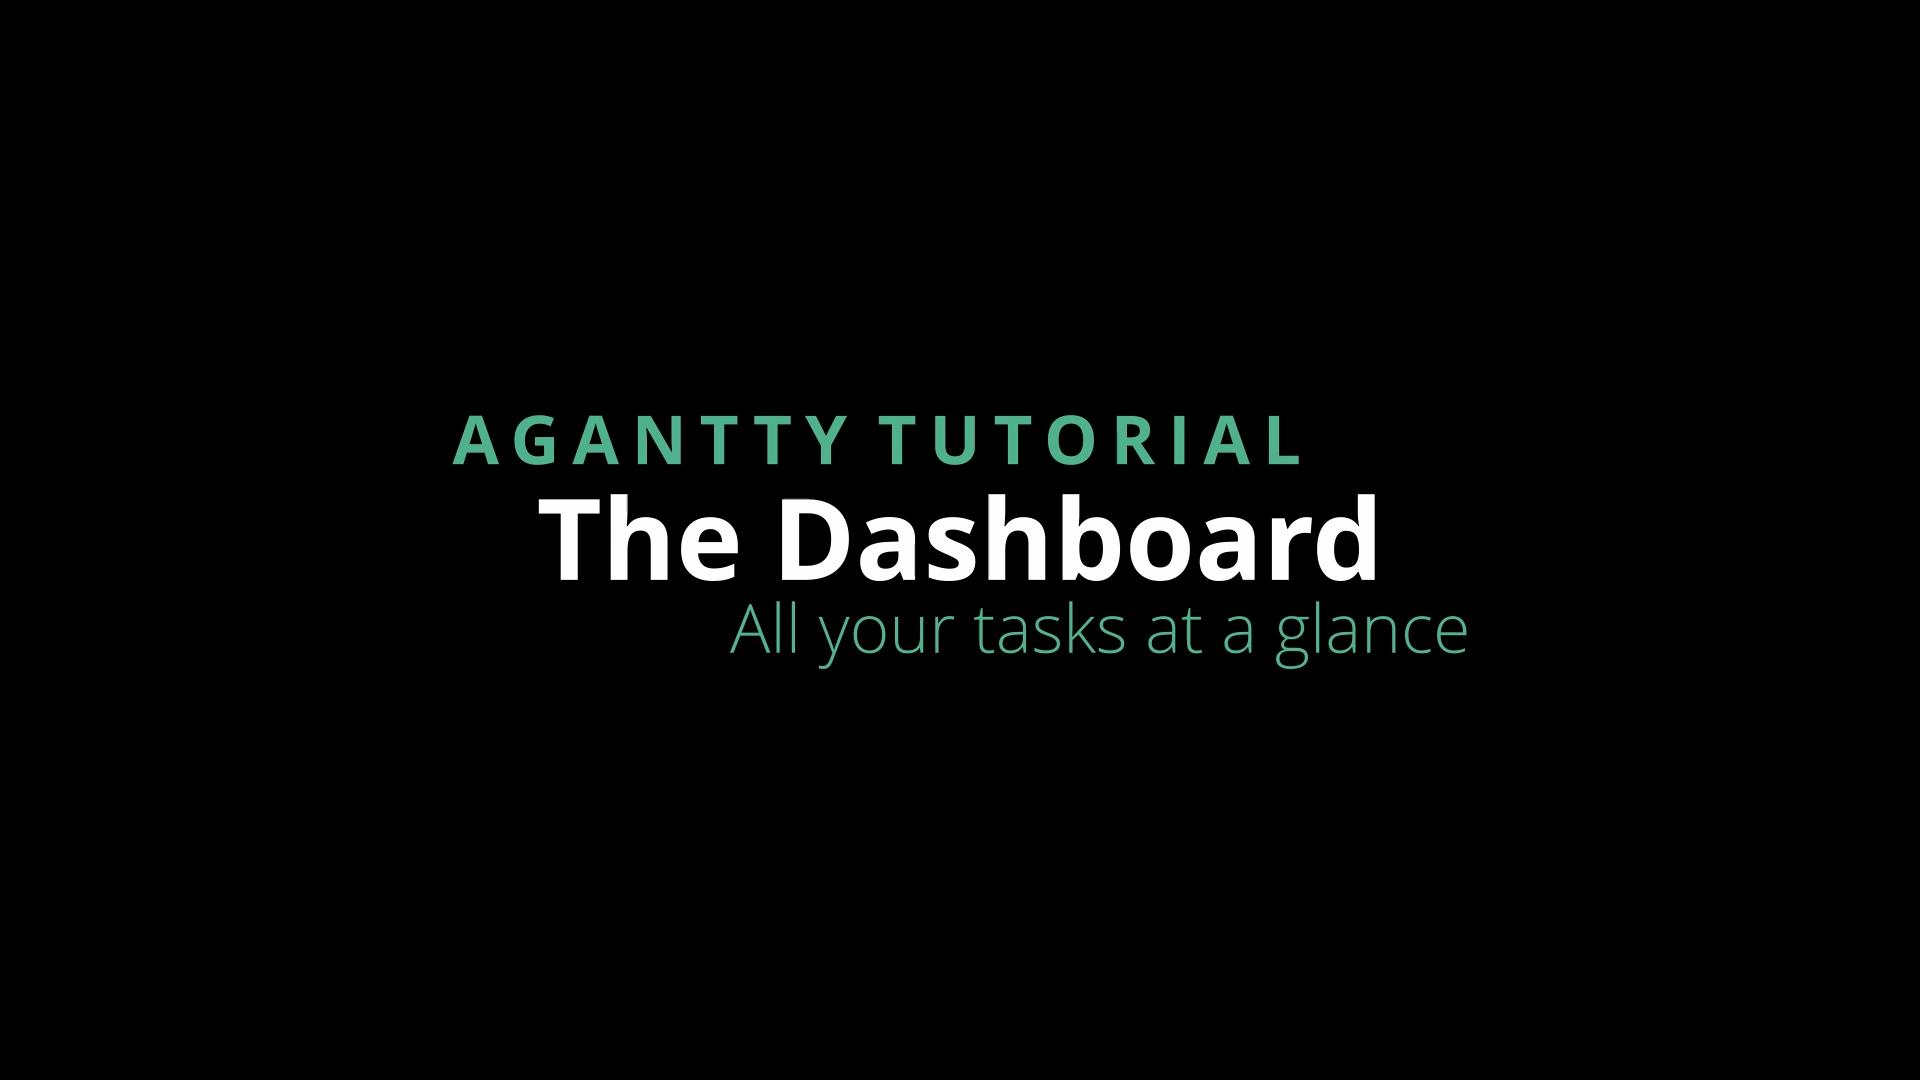 Agantty agantty tutorial series - the dashboard